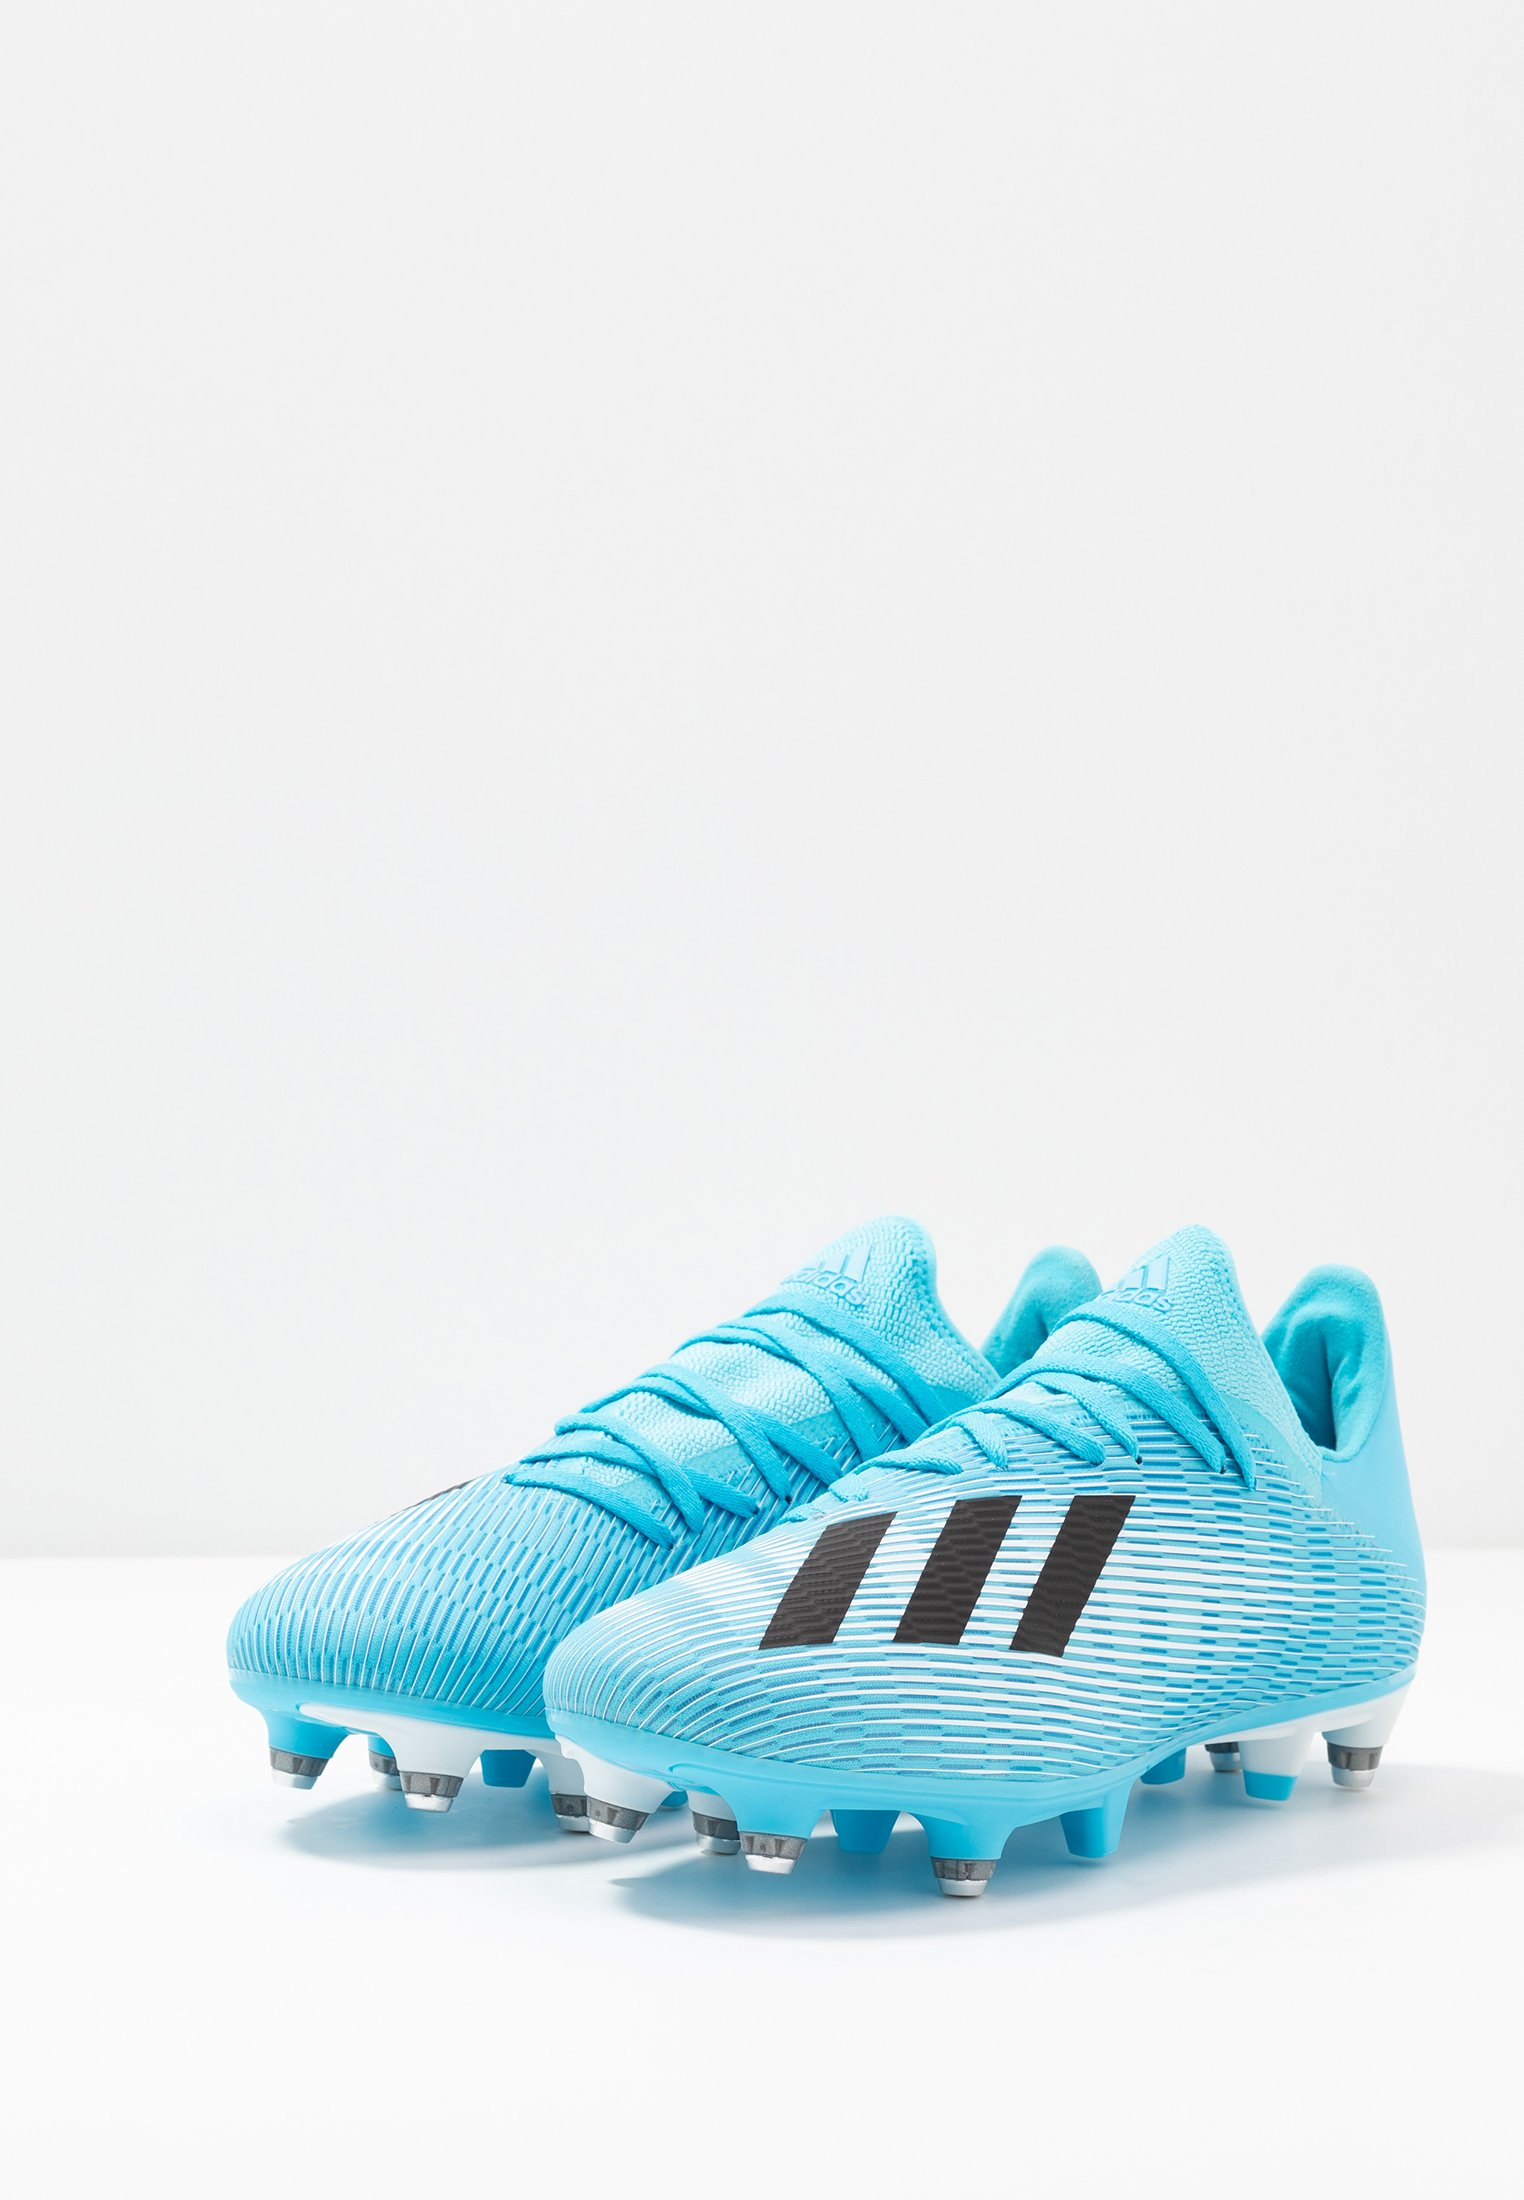 Adidas Performance X 19.3 Sg - Fußballschuh Stollen Bright Cyan/core Black/shock Pink Black Friday